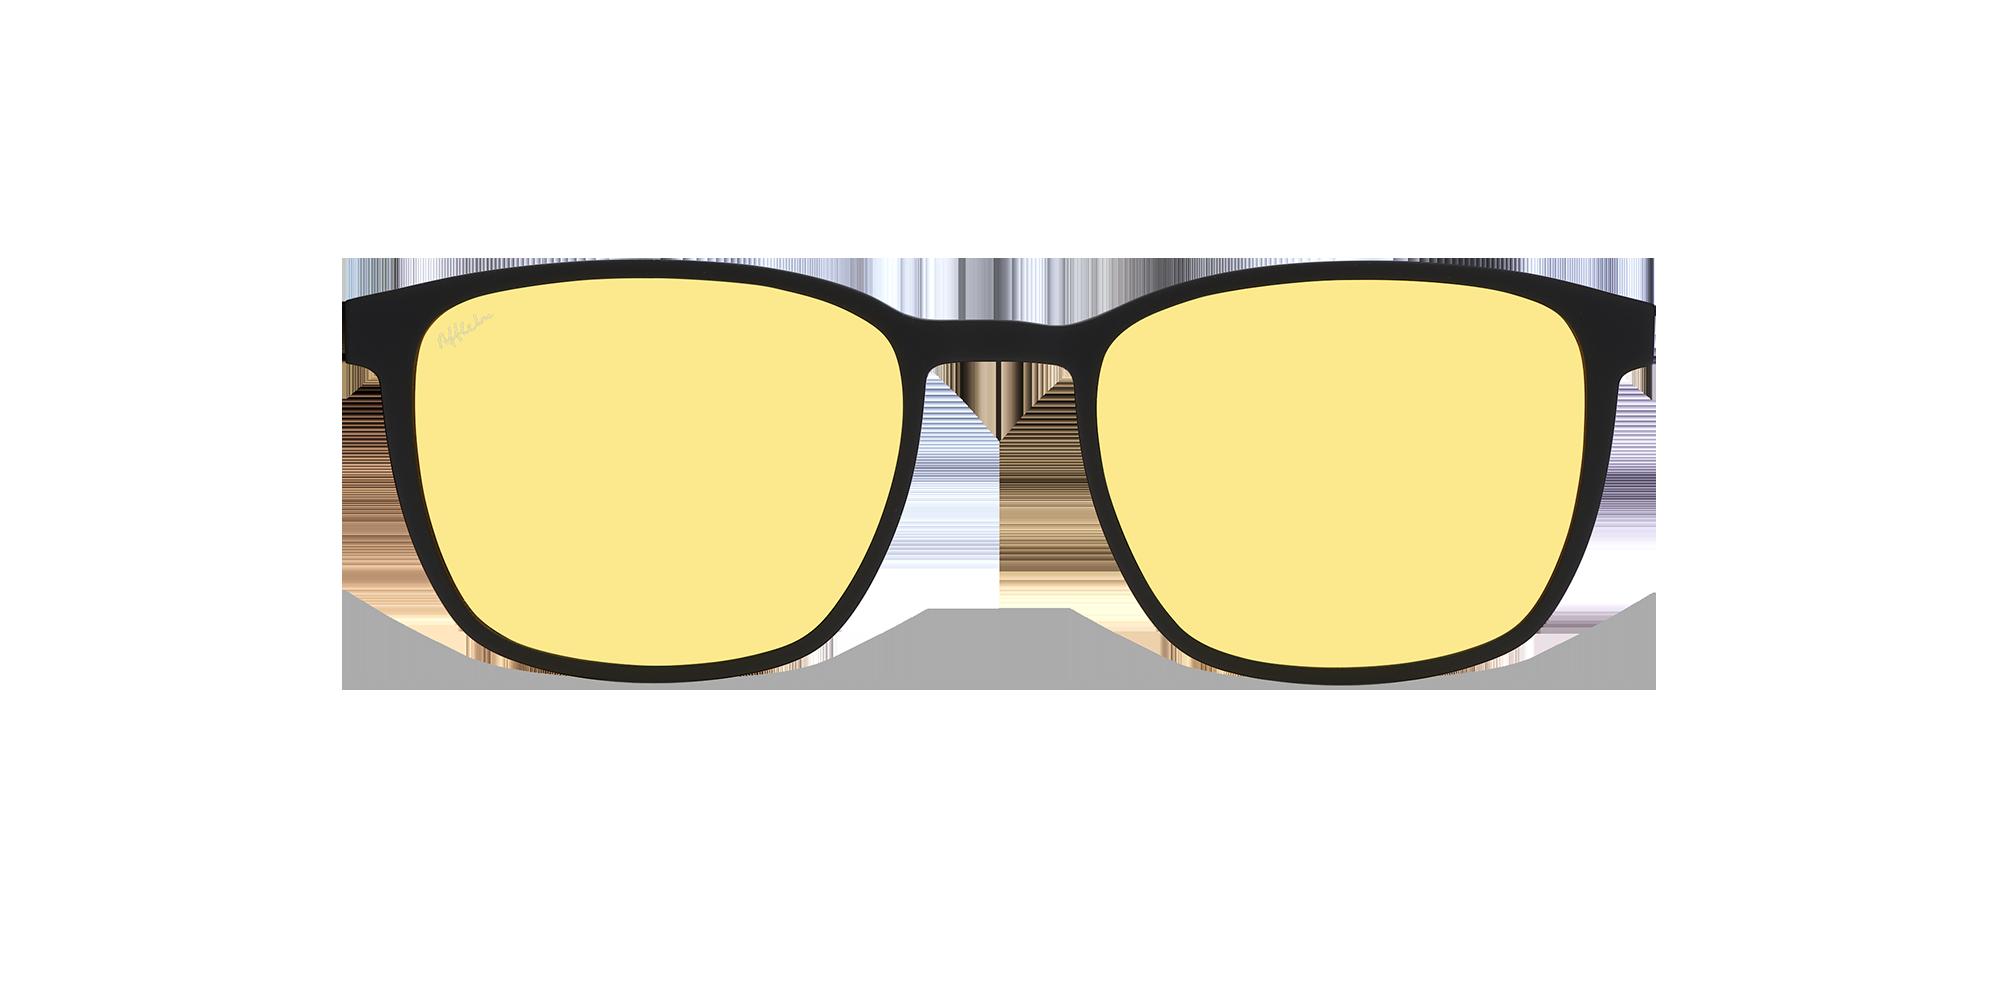 afflelou/france/products/smart_clip/clips_glasses/TMK42YEBK015319.png